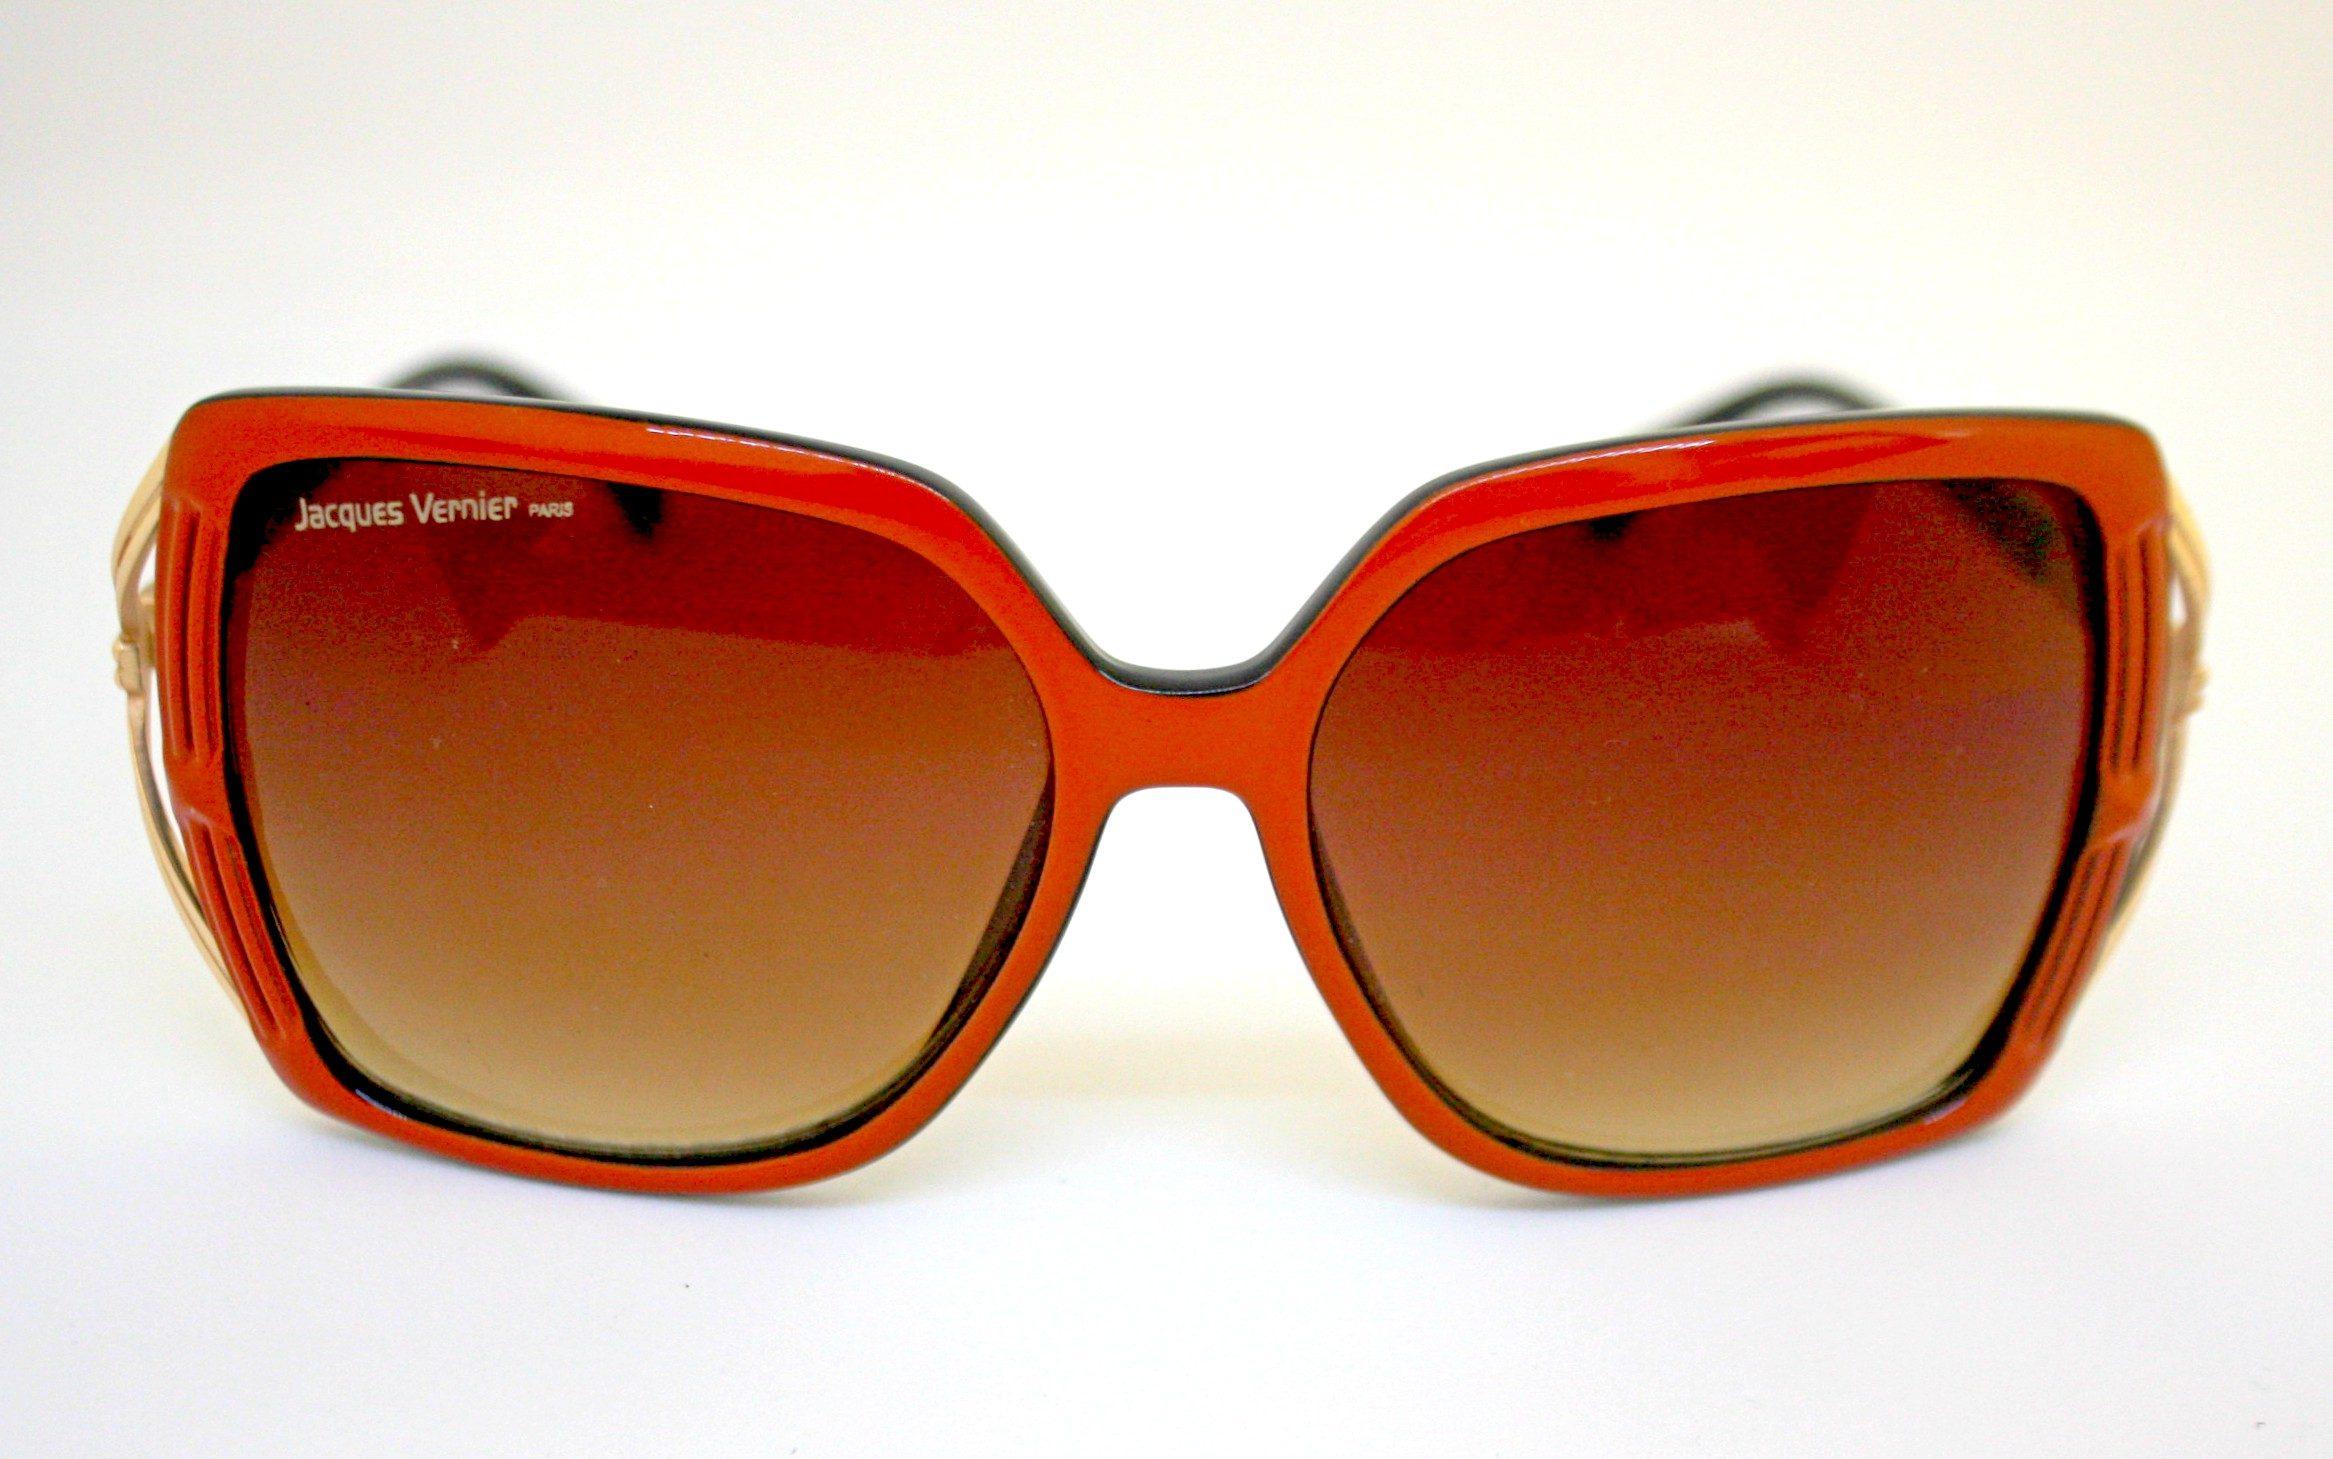 Óculos de Sol Jacques Vernier 9267 ótica em casa